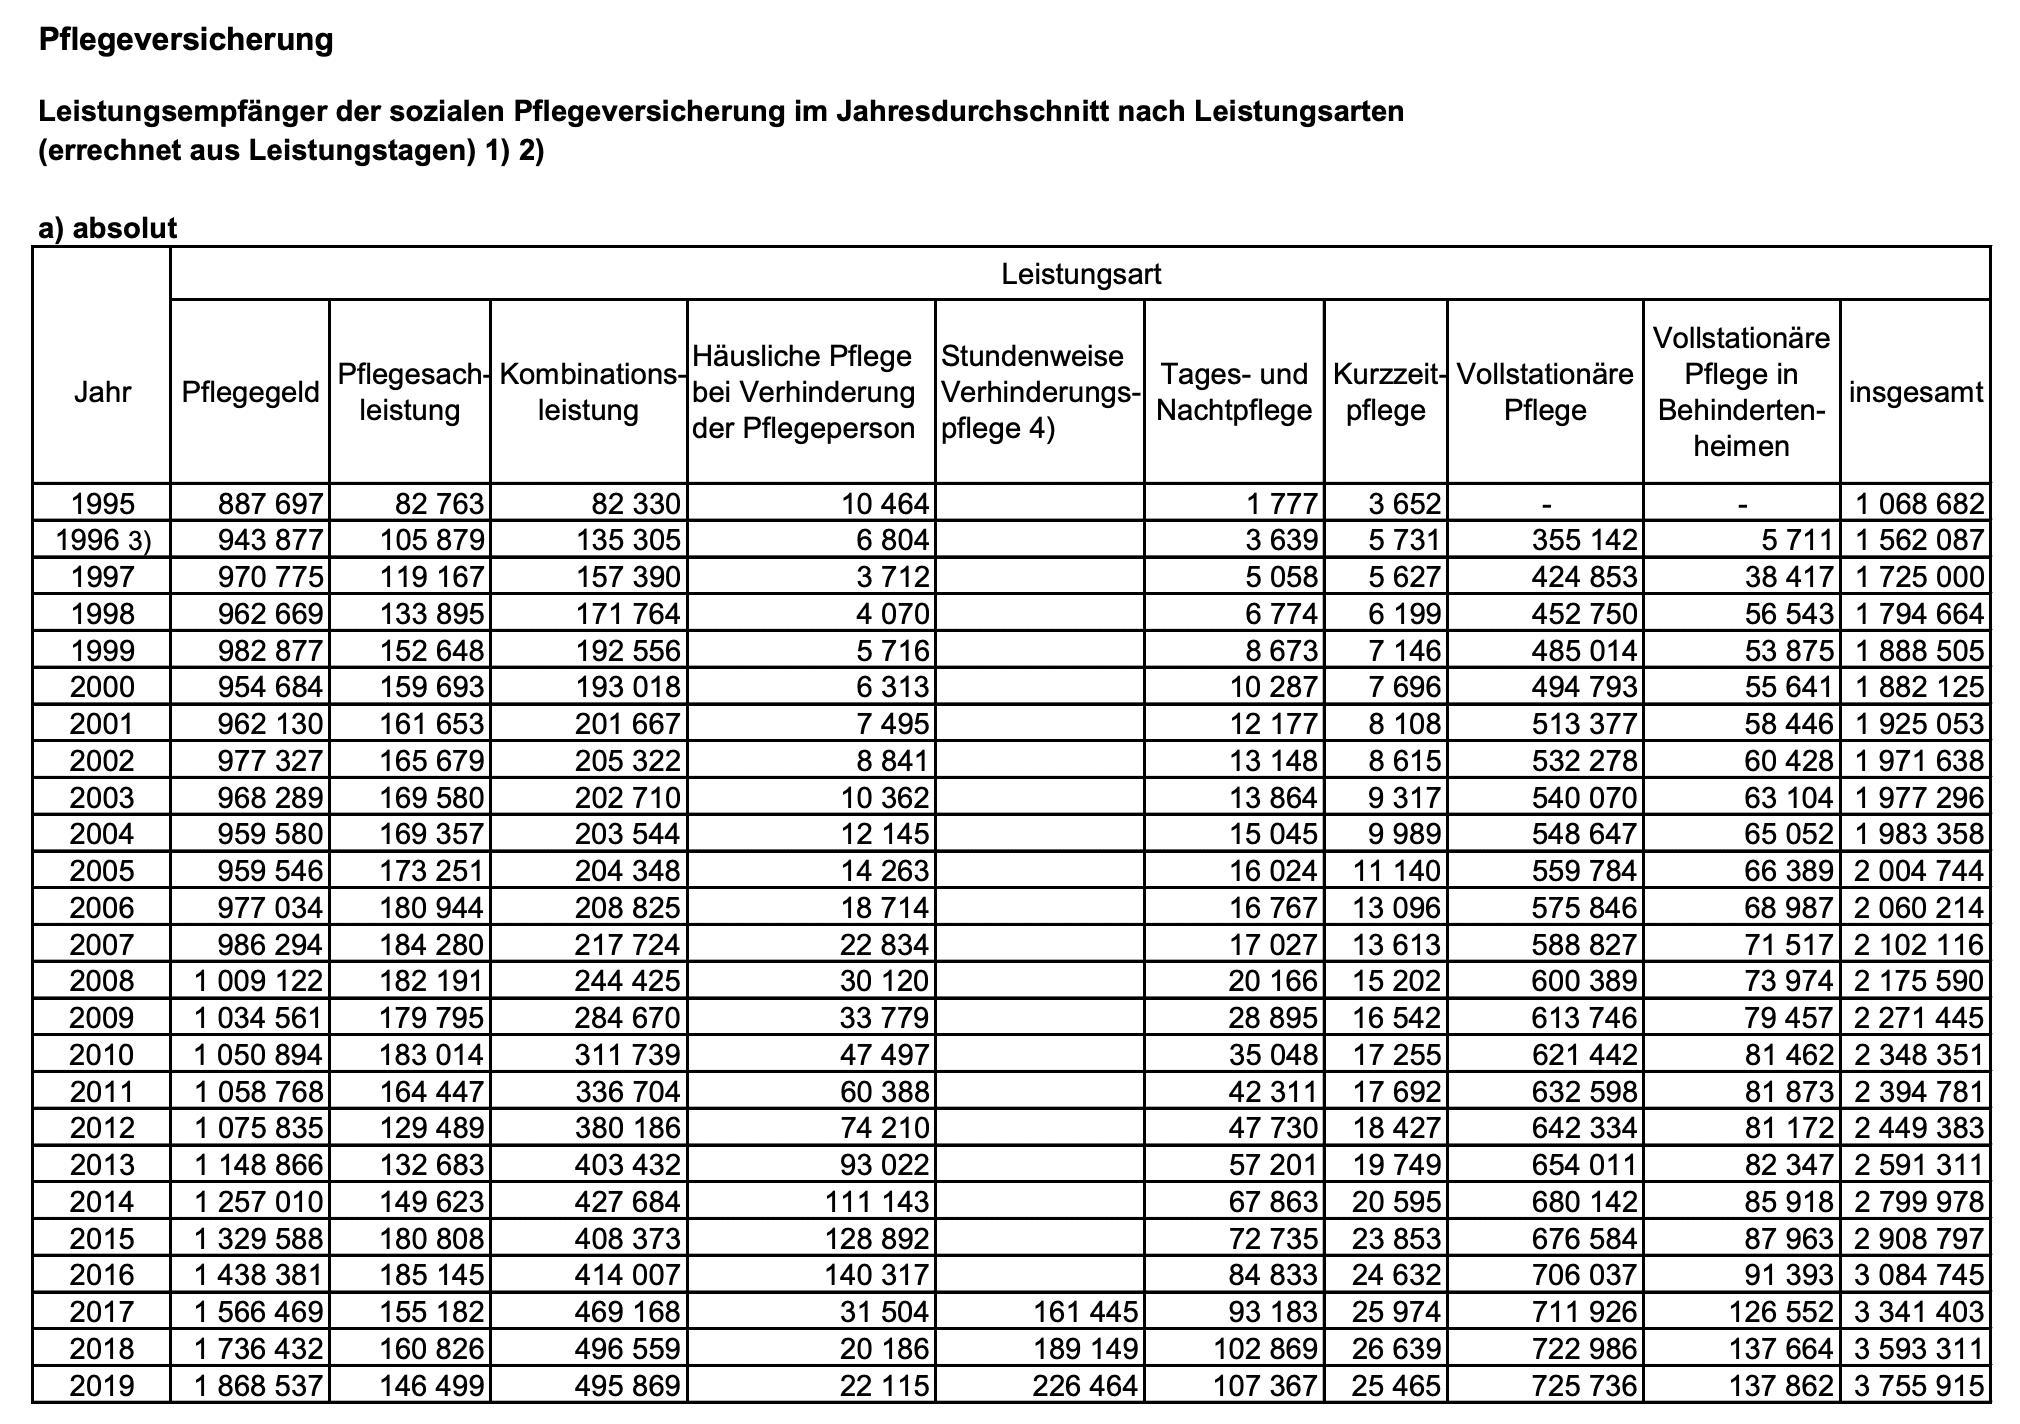 BMG Statistik